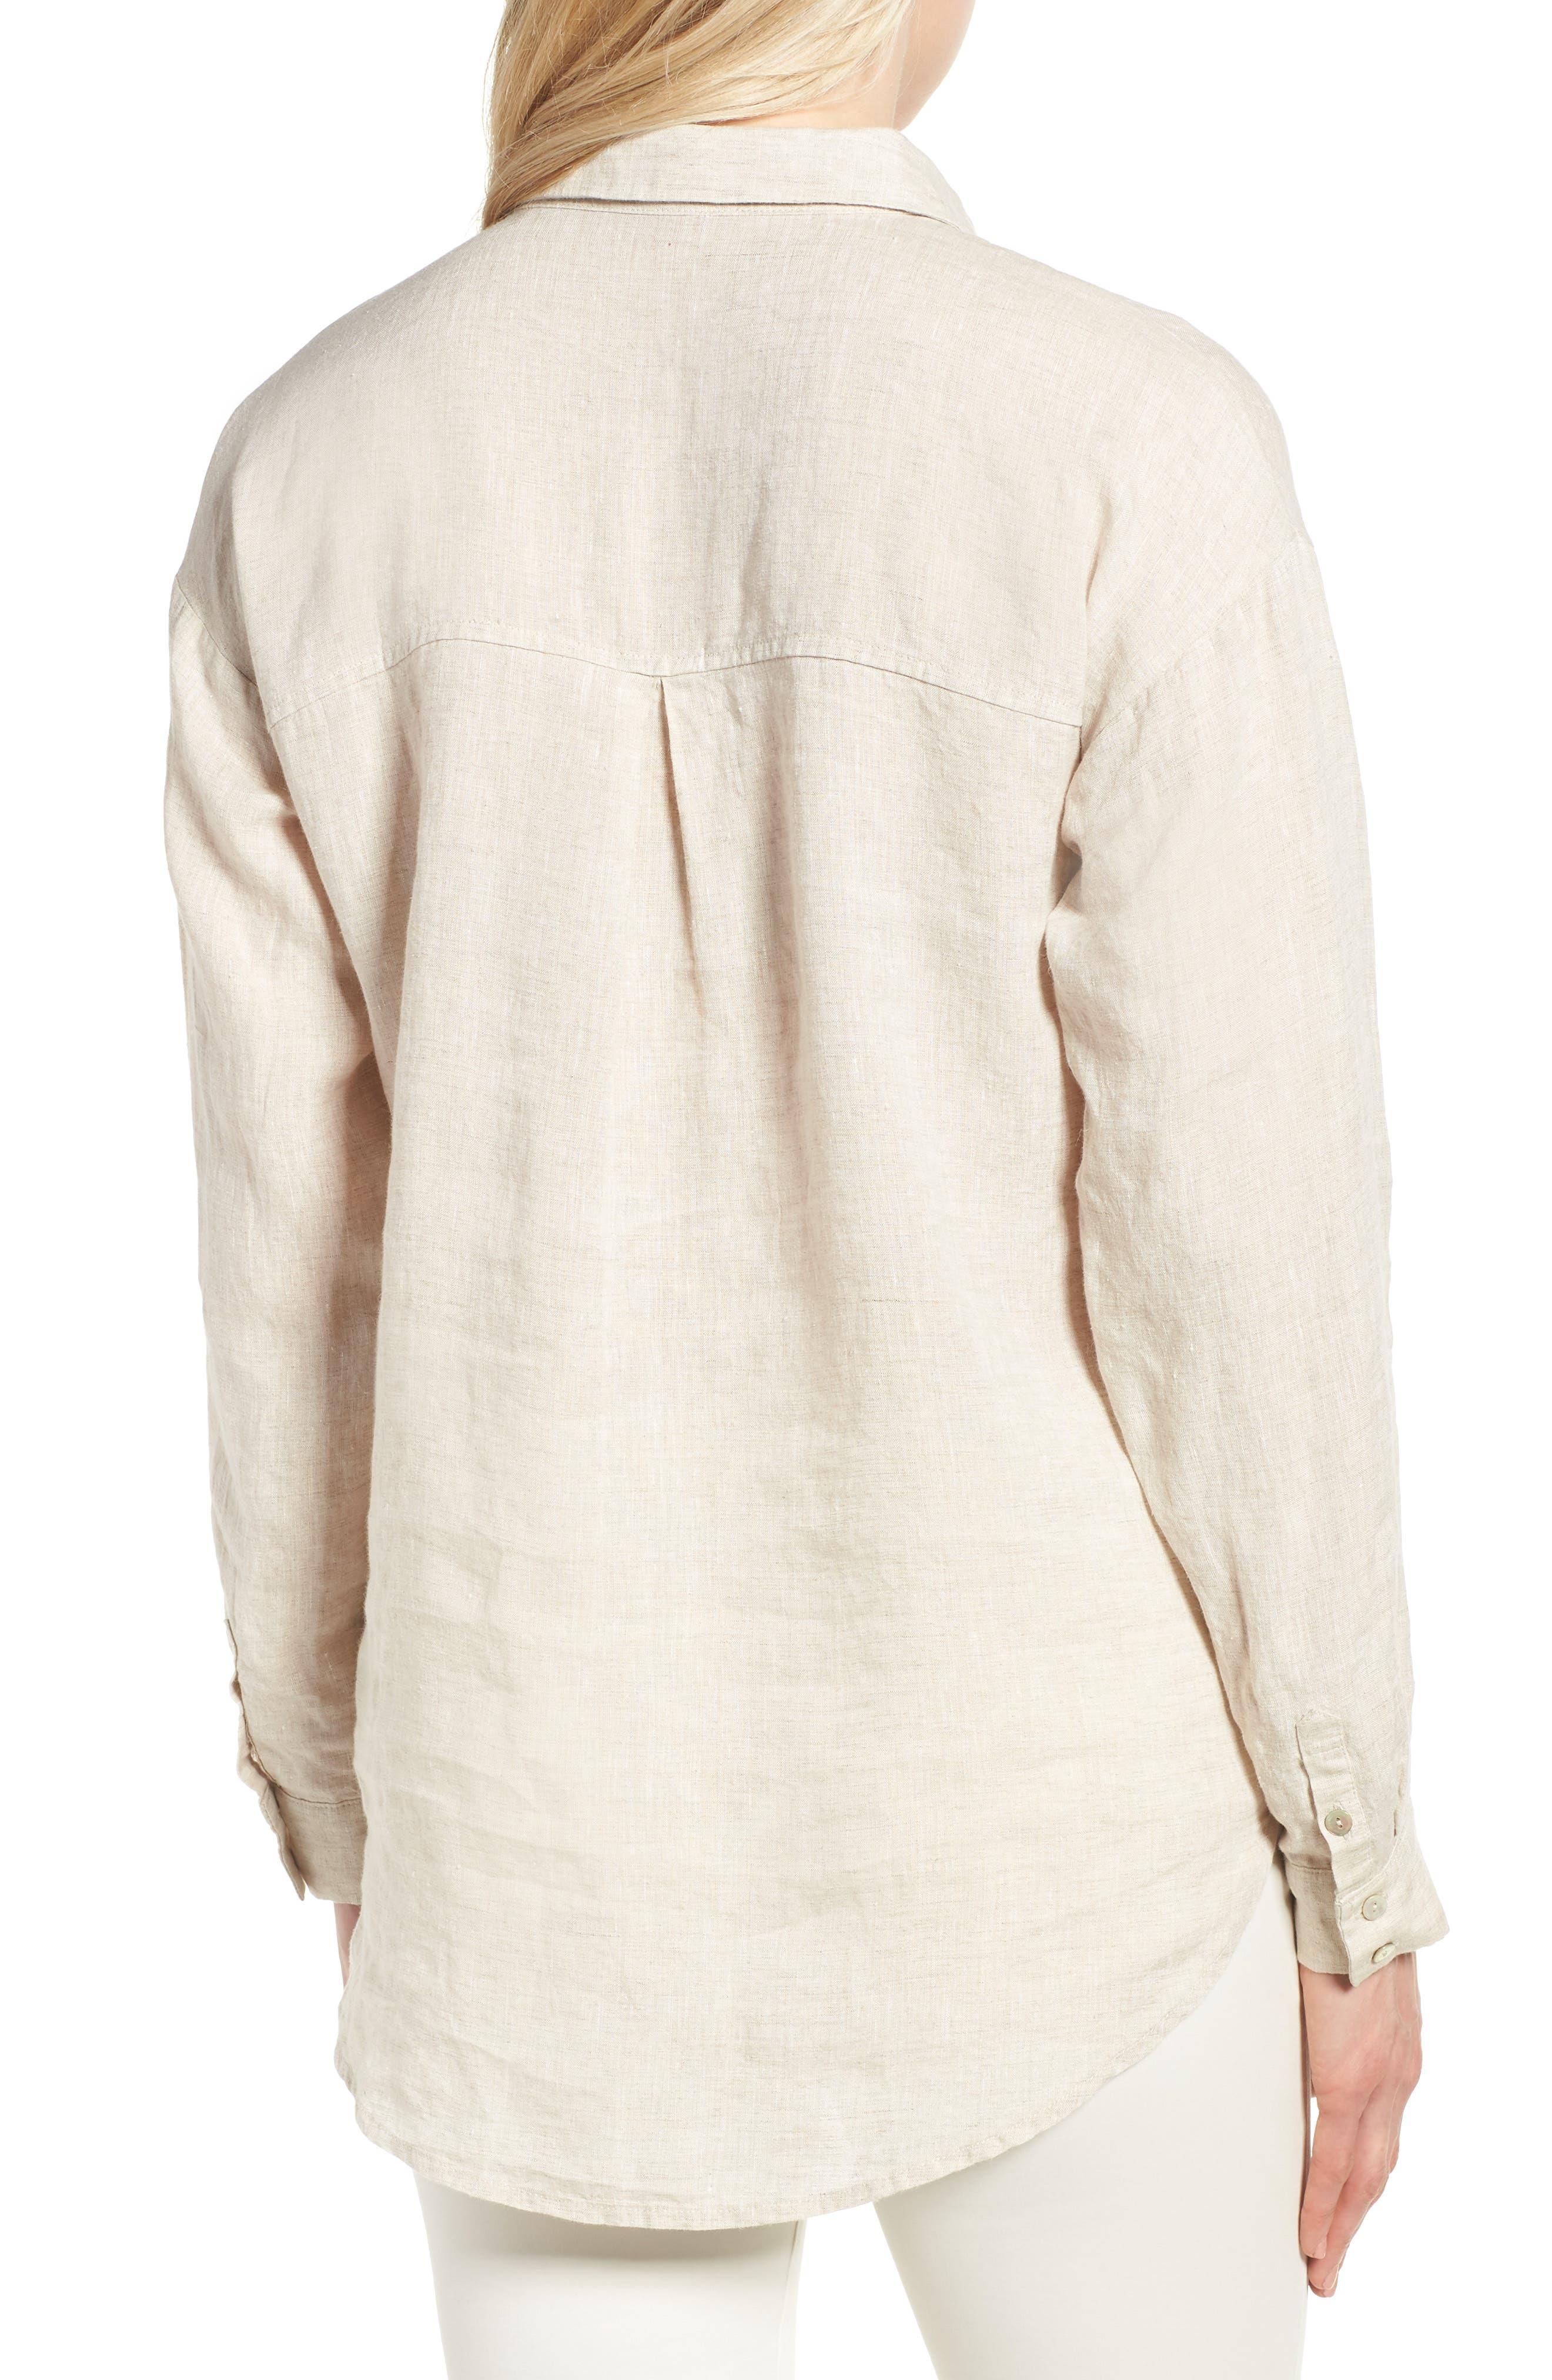 Organic Linen Shirt,                             Alternate thumbnail 2, color,                             257